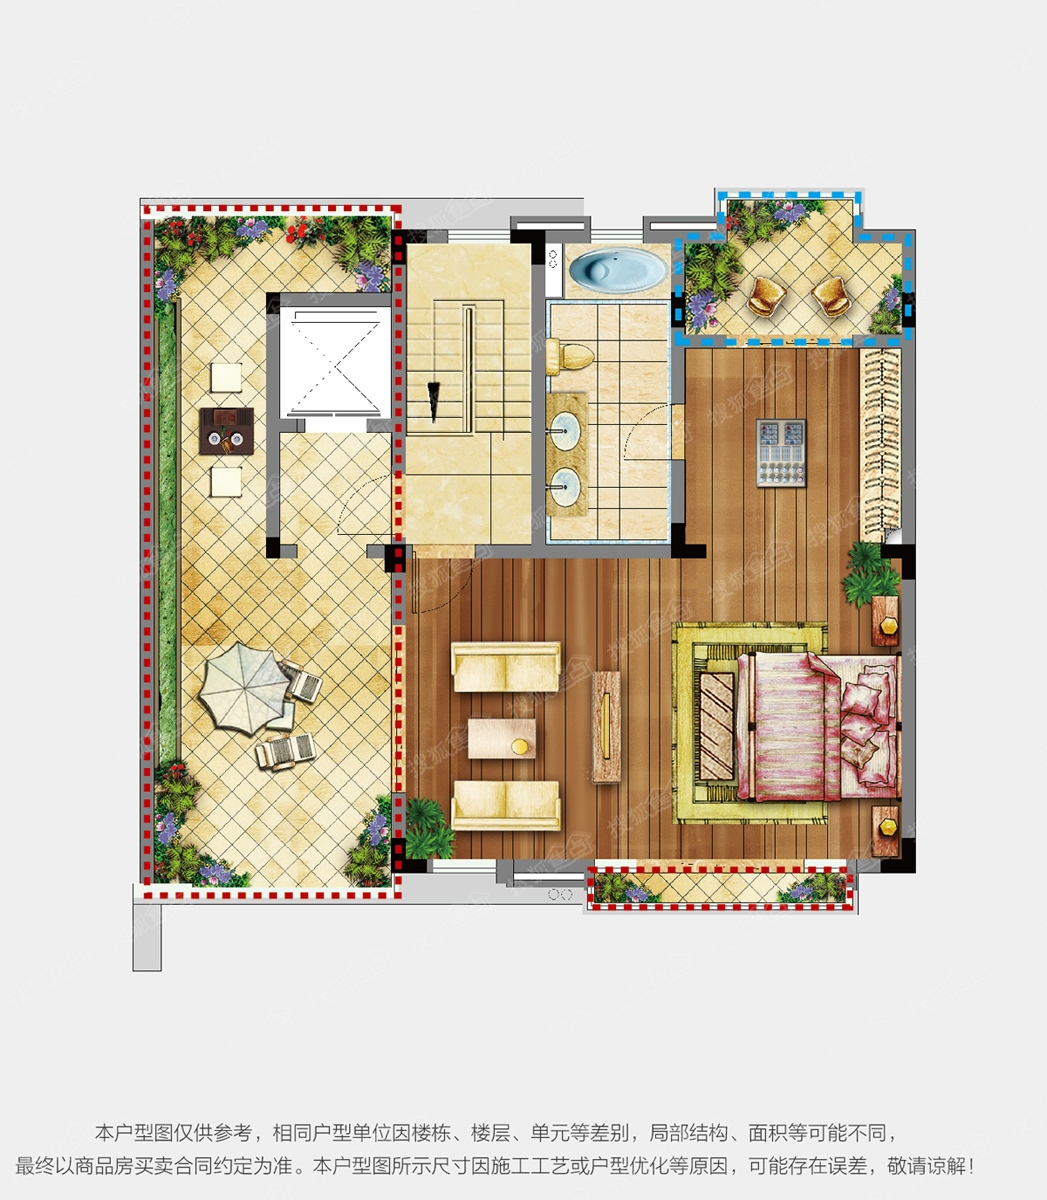 6aOe5Lh5LiL6L29MjAxMg==_世茂天樾联排205㎡5室2厅4卫l2中间套一层户型